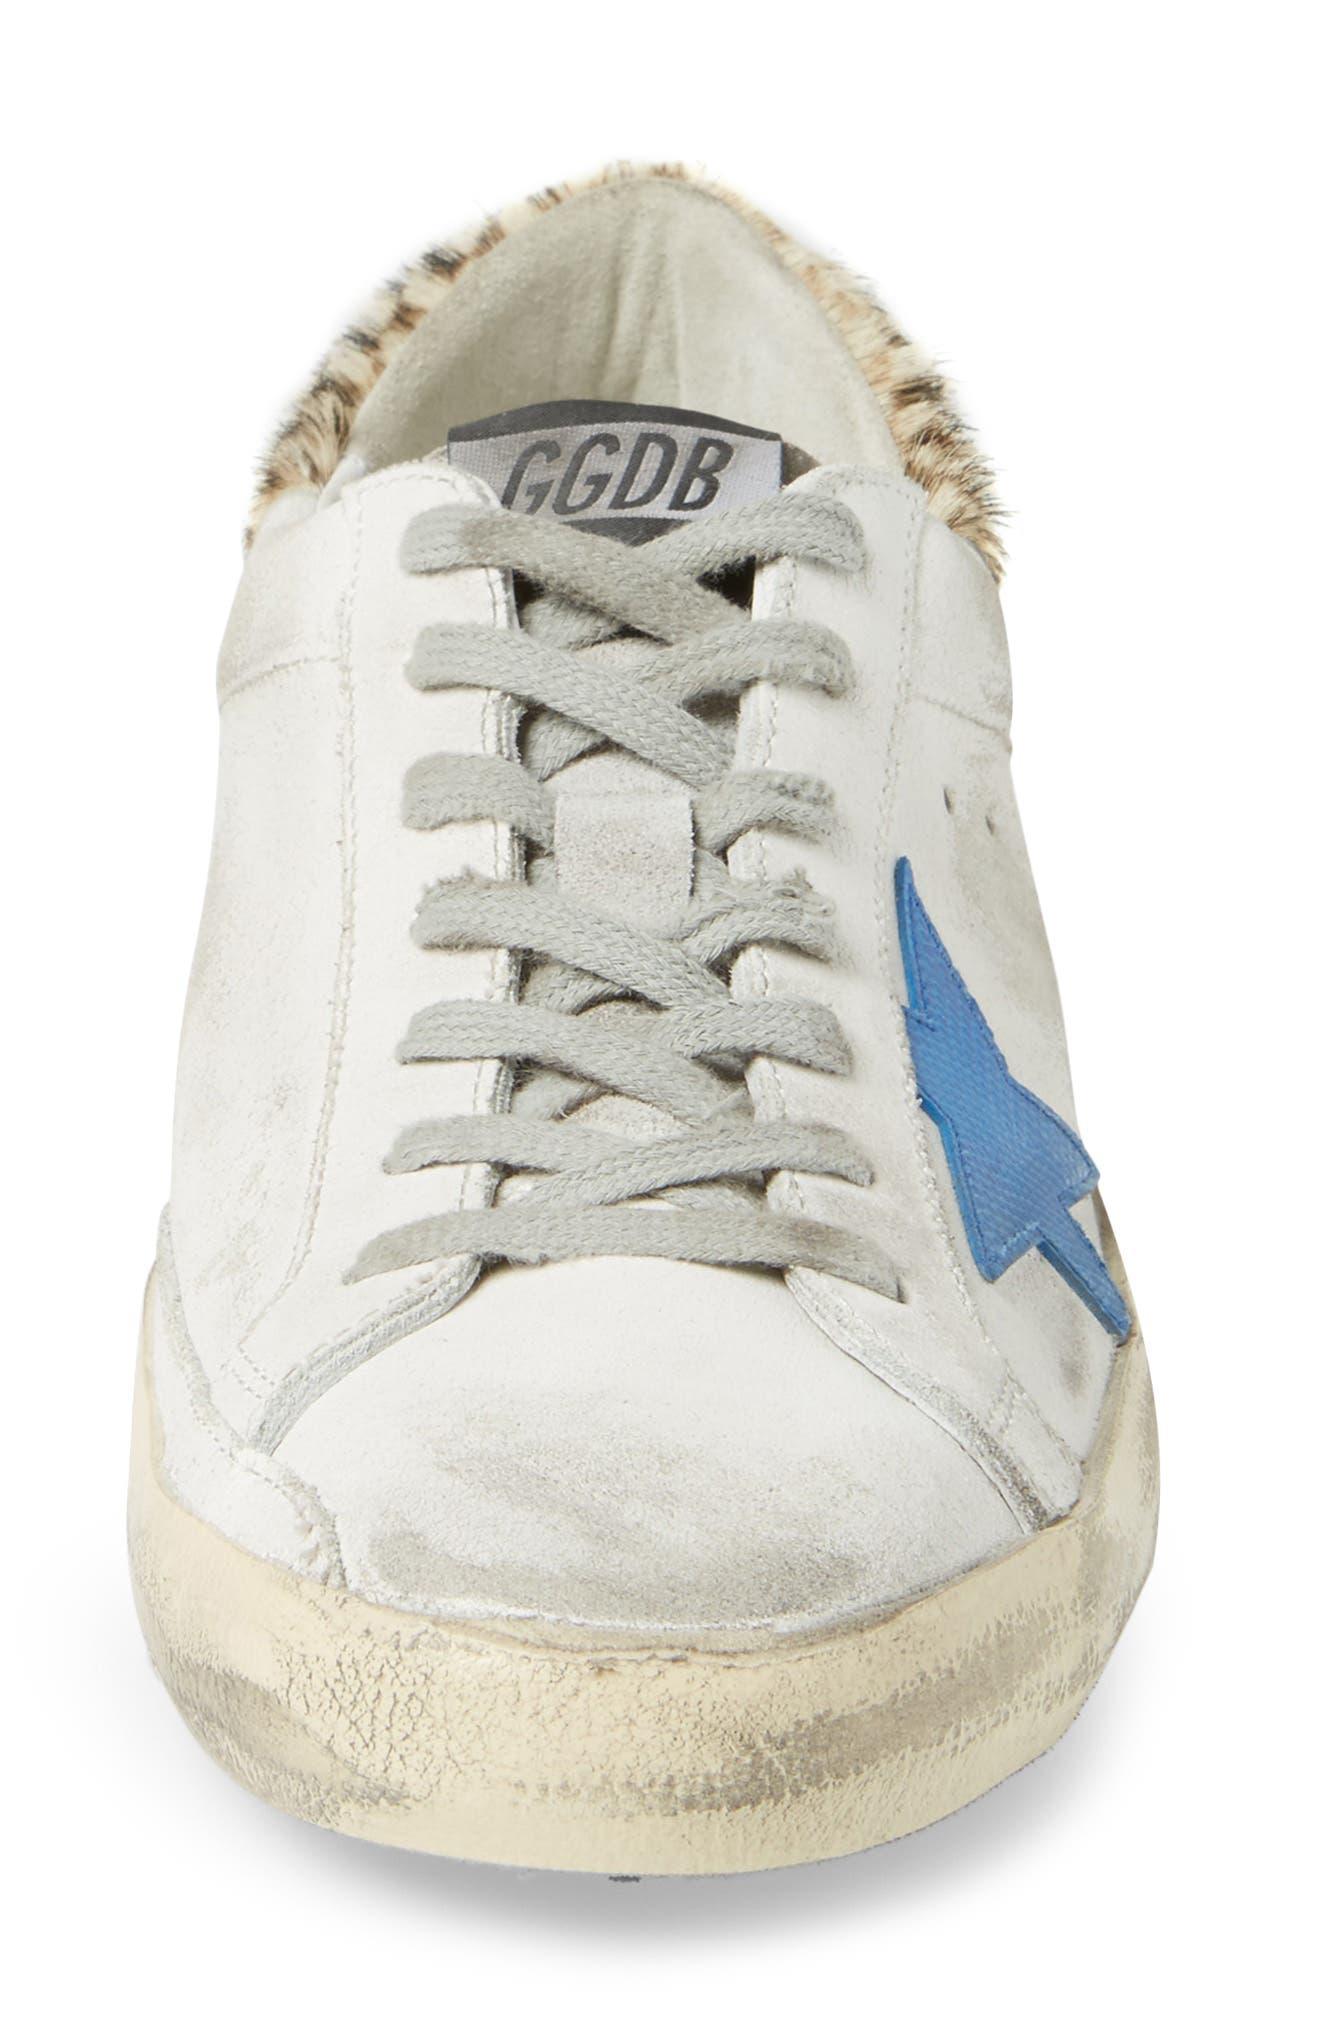 Superstar Sneaker with Genuine Calf Hair Trim,                             Alternate thumbnail 4, color,